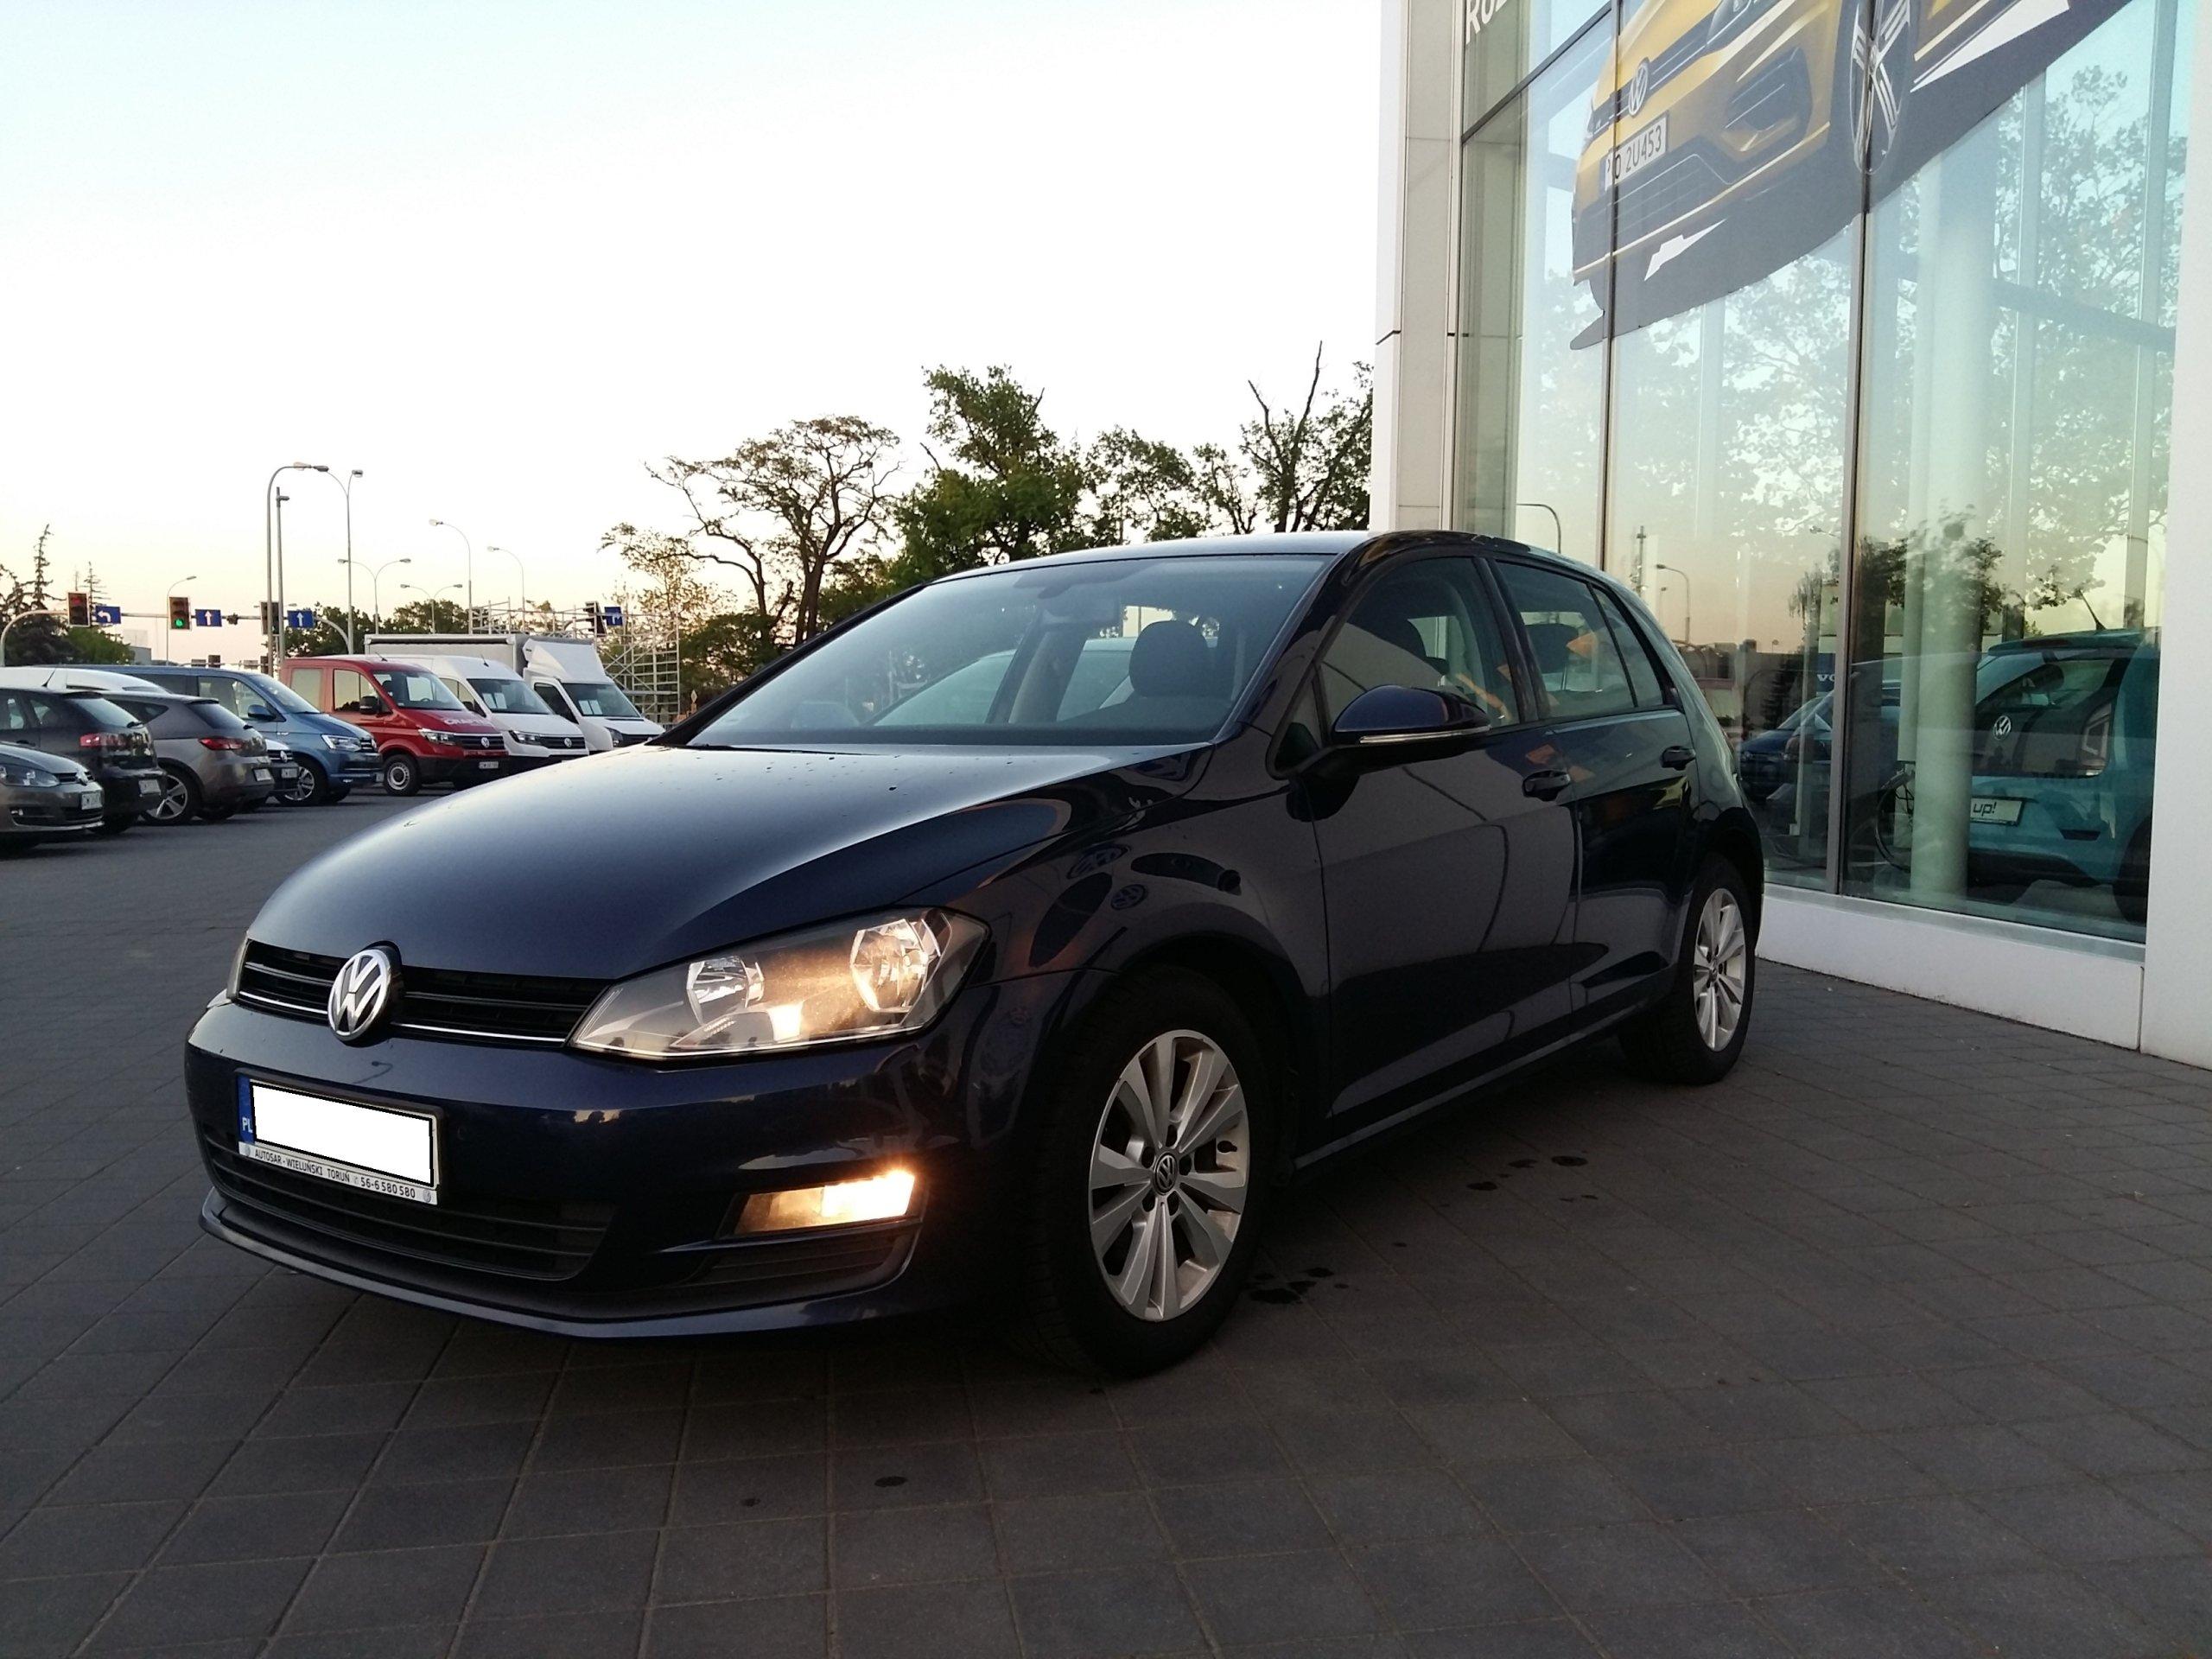 VW GOLF VII 1.6TDI 2014r.*SALON POLSKA*FAKTURA VAT